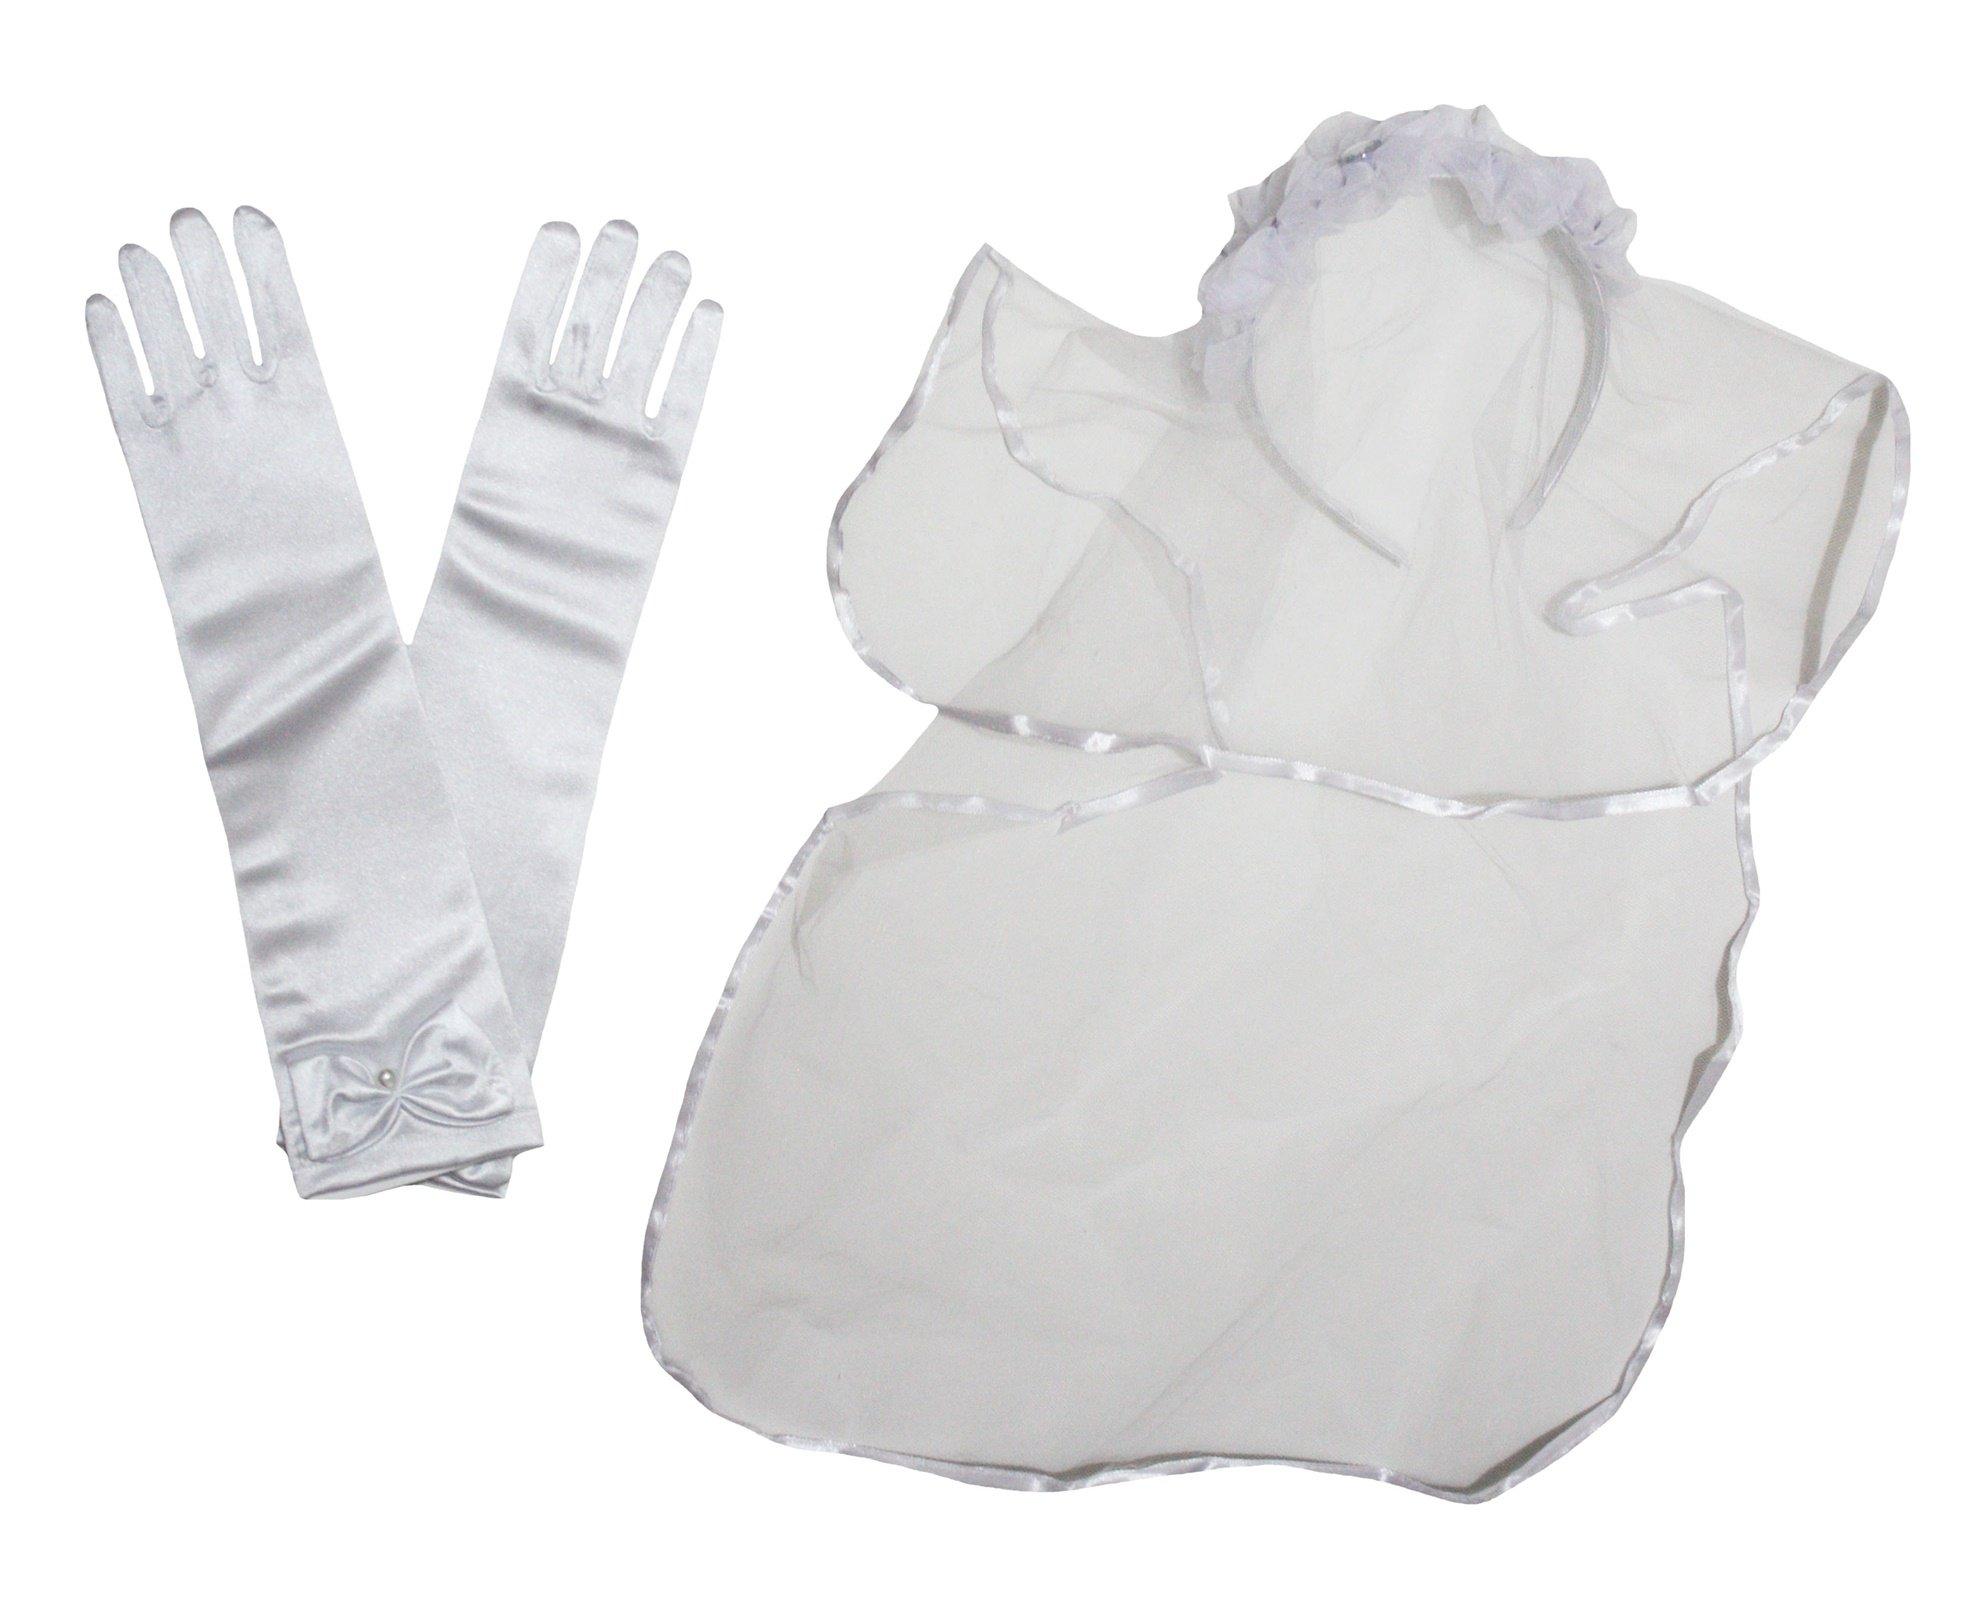 Petitebella White Flower Girl Veils Headband Gloves Wedding Children Accessory (One Size)